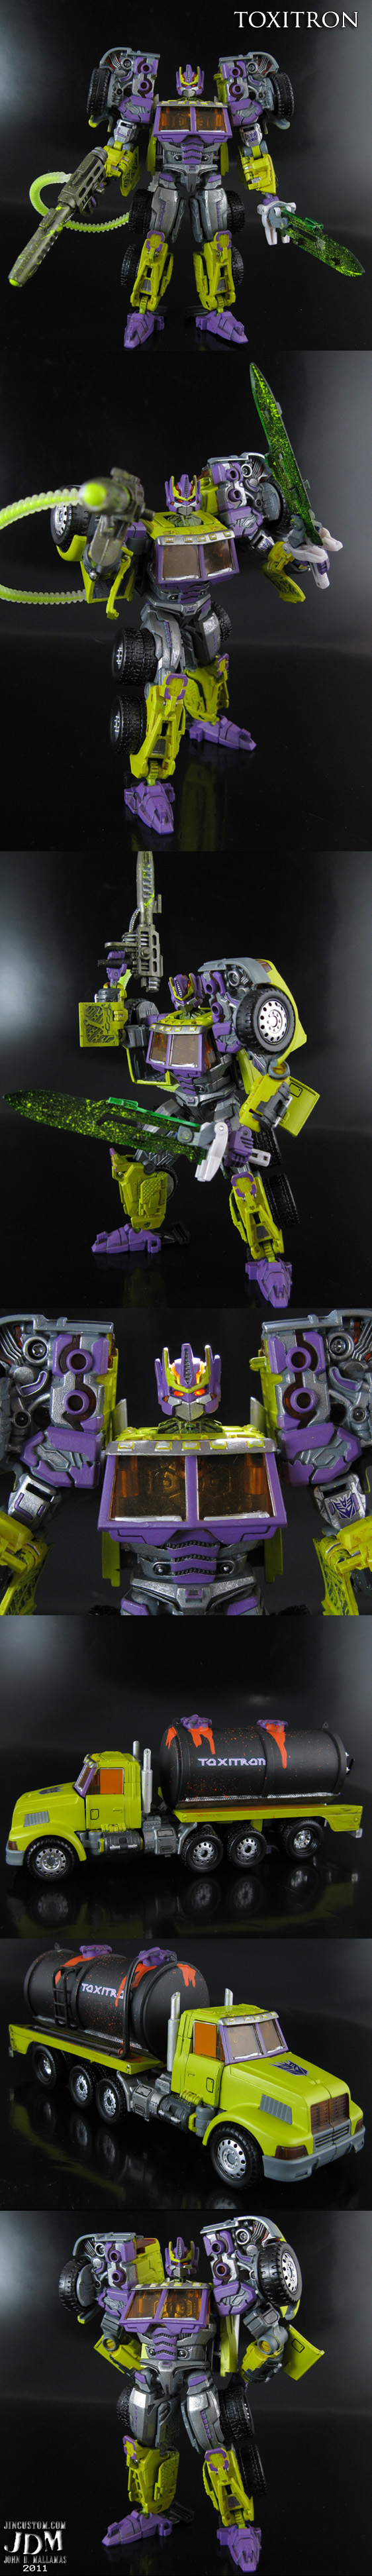 Toxitron Transformers